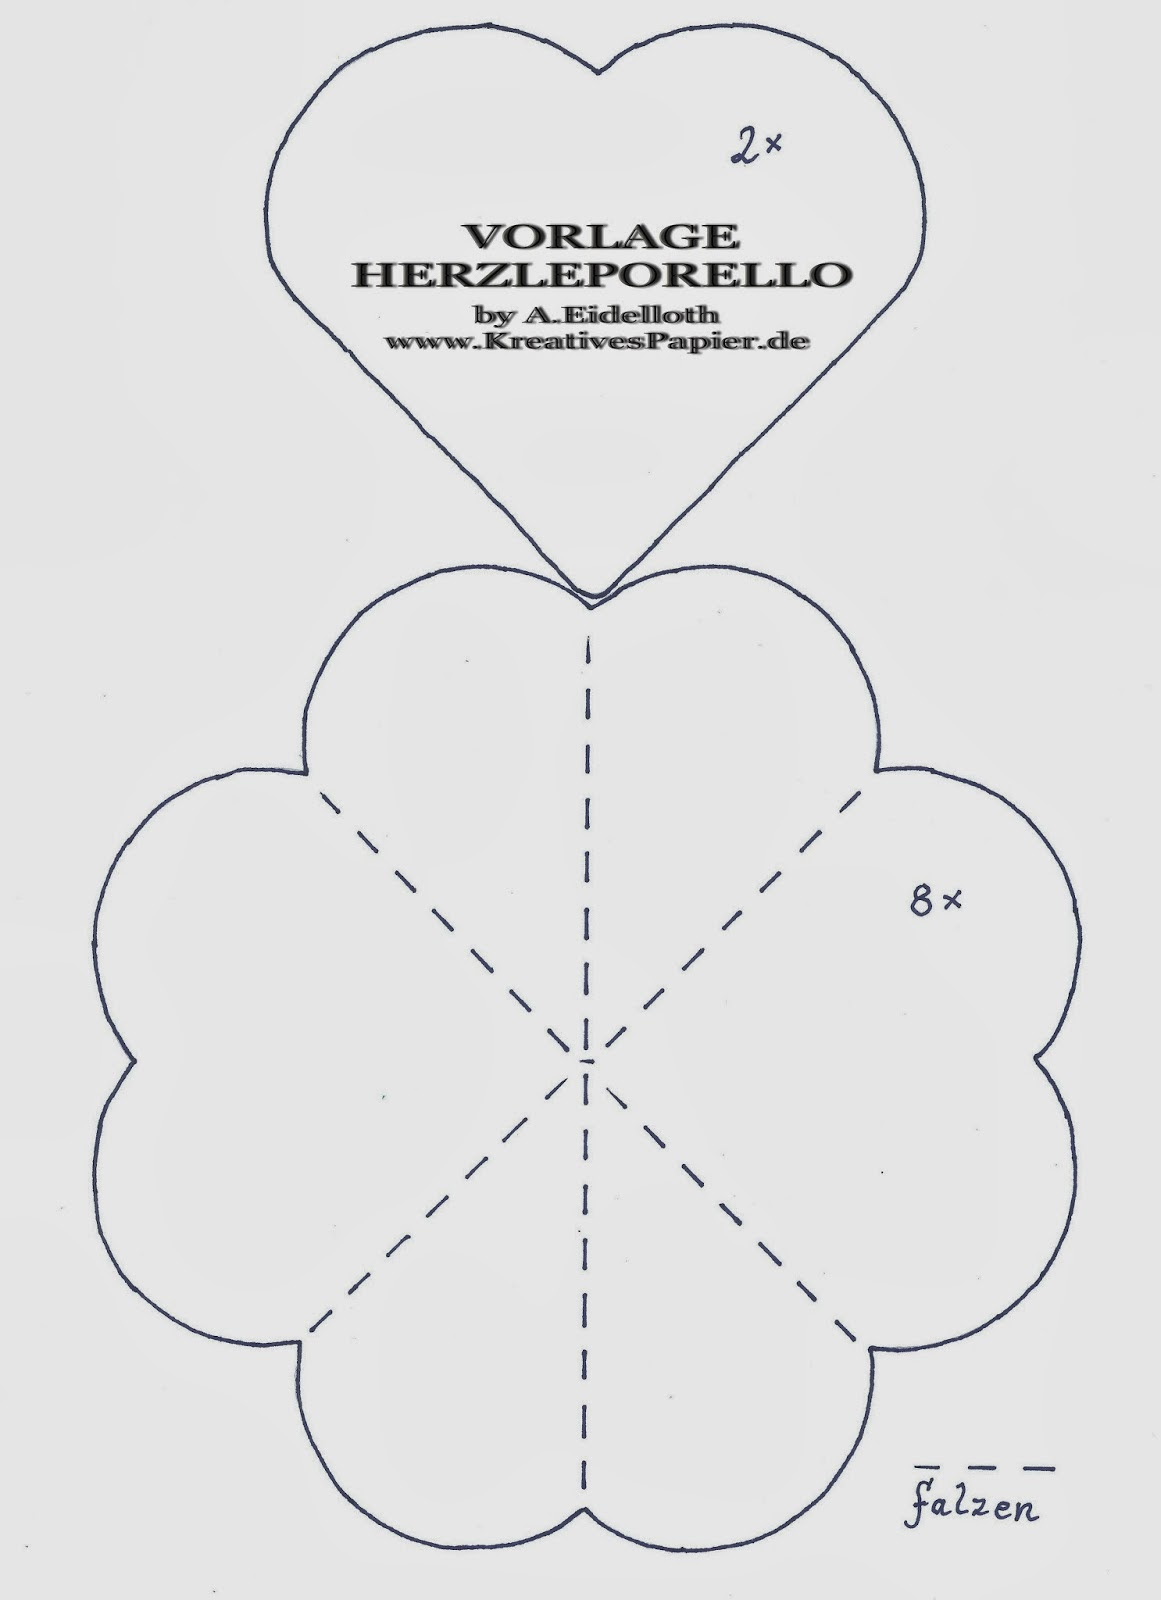 Stempeleinmaleins: Herz-Leporello - heart-leporello